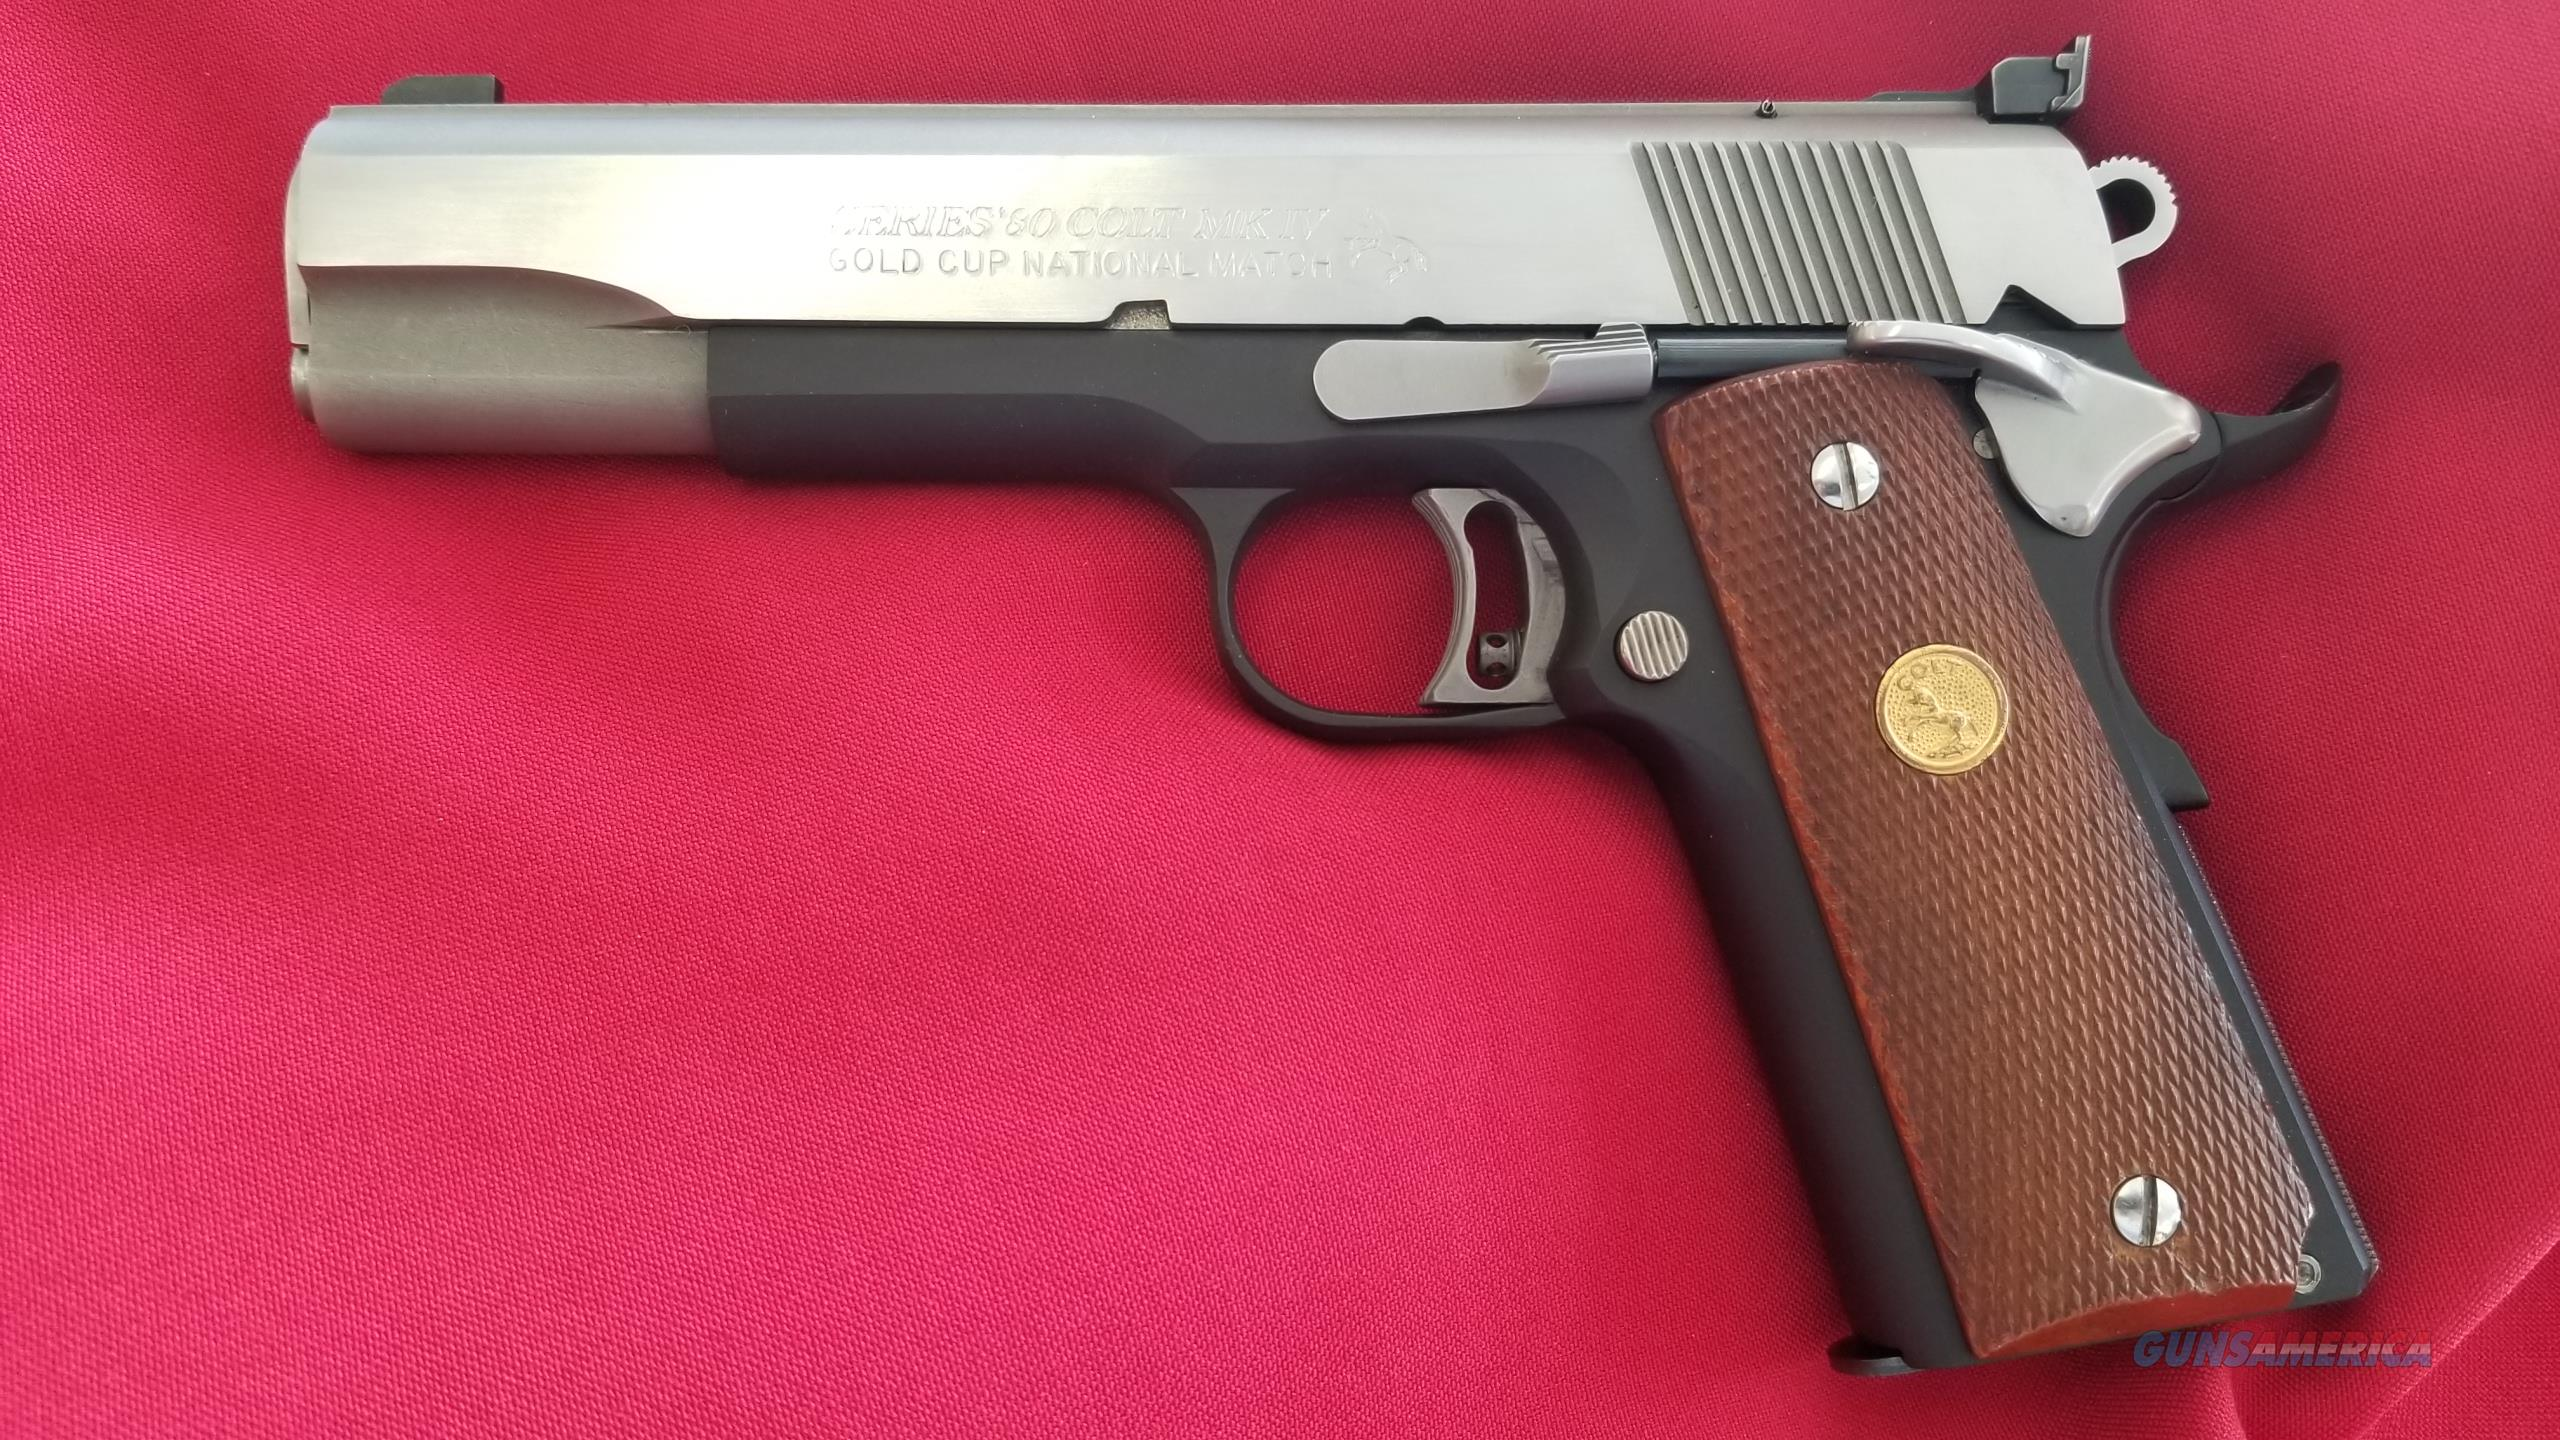 Used Colt Mark IV Gold Cup National Match .45 Colt Two-Tone  Guns > Pistols > Colt Automatic Pistols (1911 & Var)